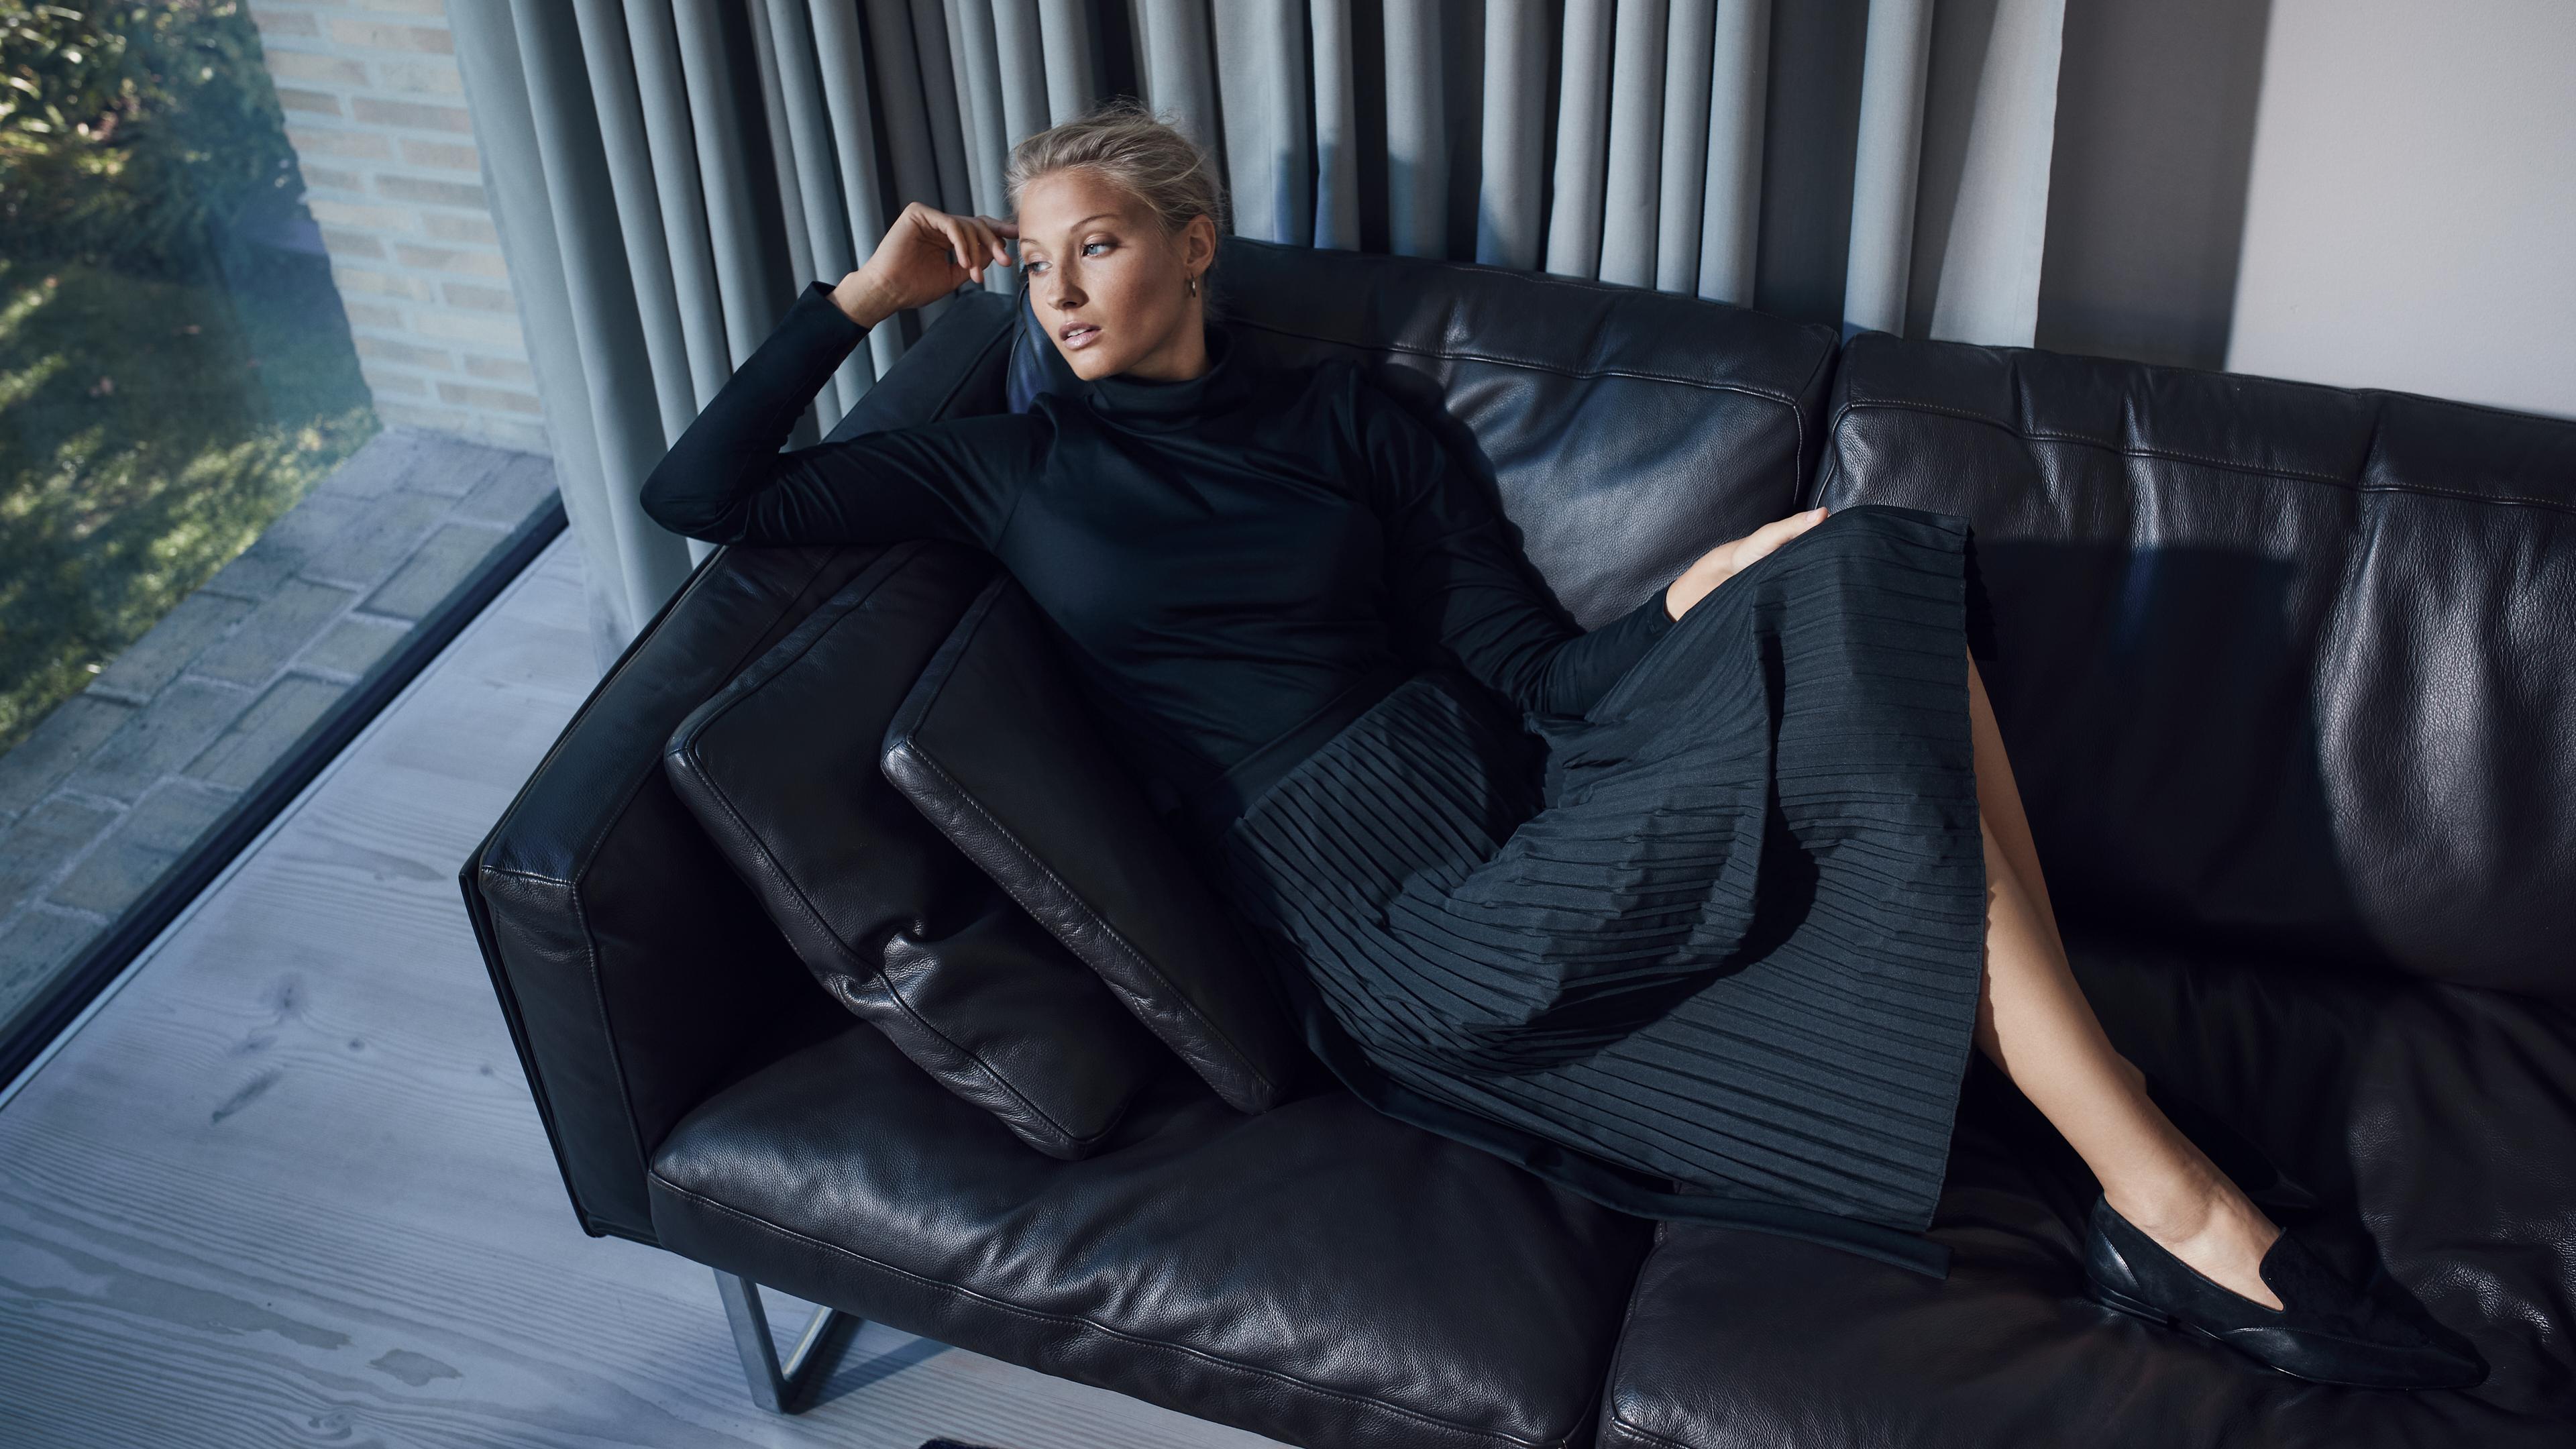 bernd-westphal-stillstars-vanlaack-women-auttum-winter-2020-fashion-still-life-photography-006 16X9